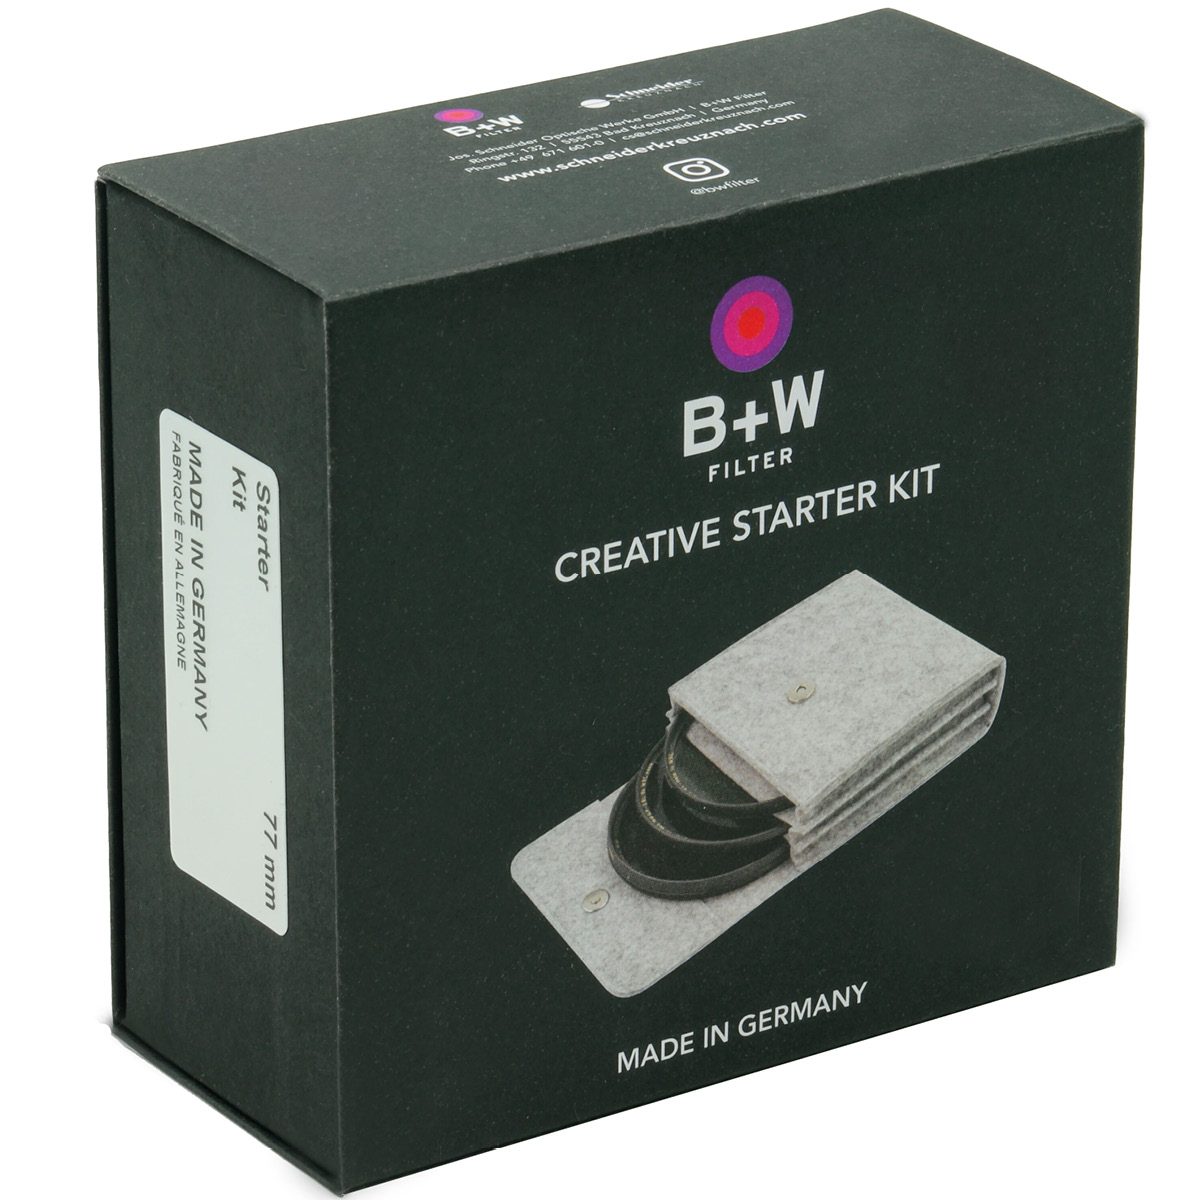 B+W Creative Starter Kit 55 mm